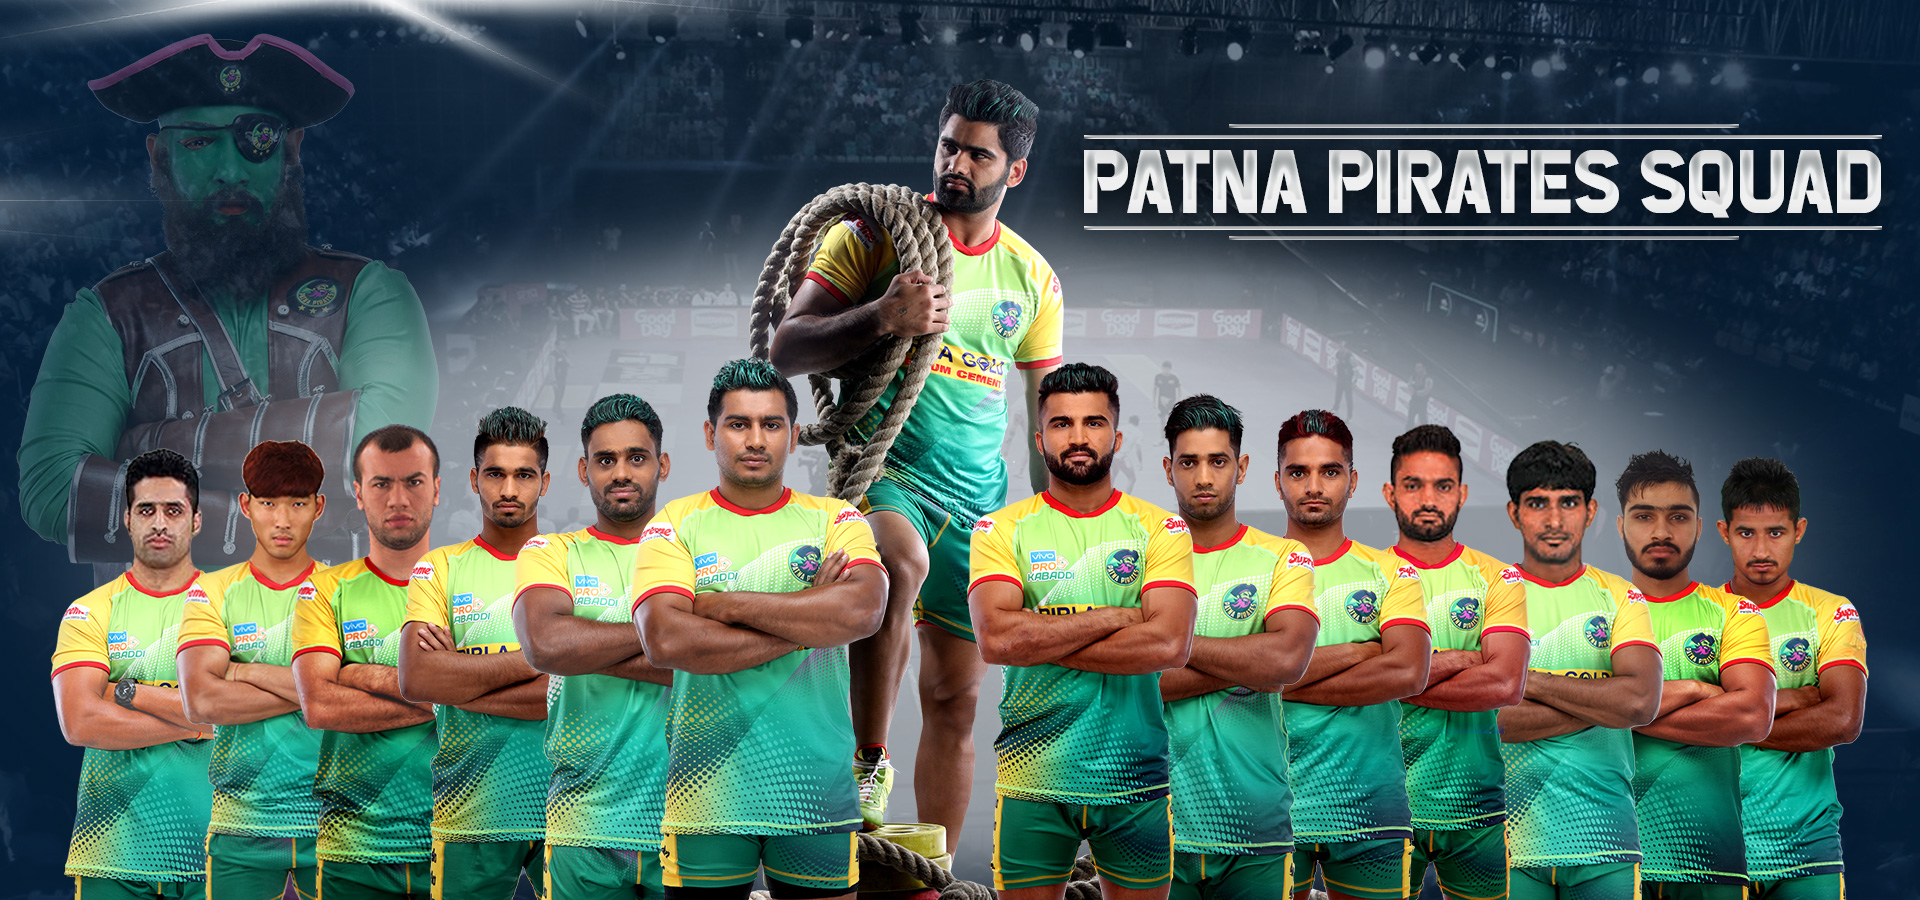 Patna Pirates Squad 2019